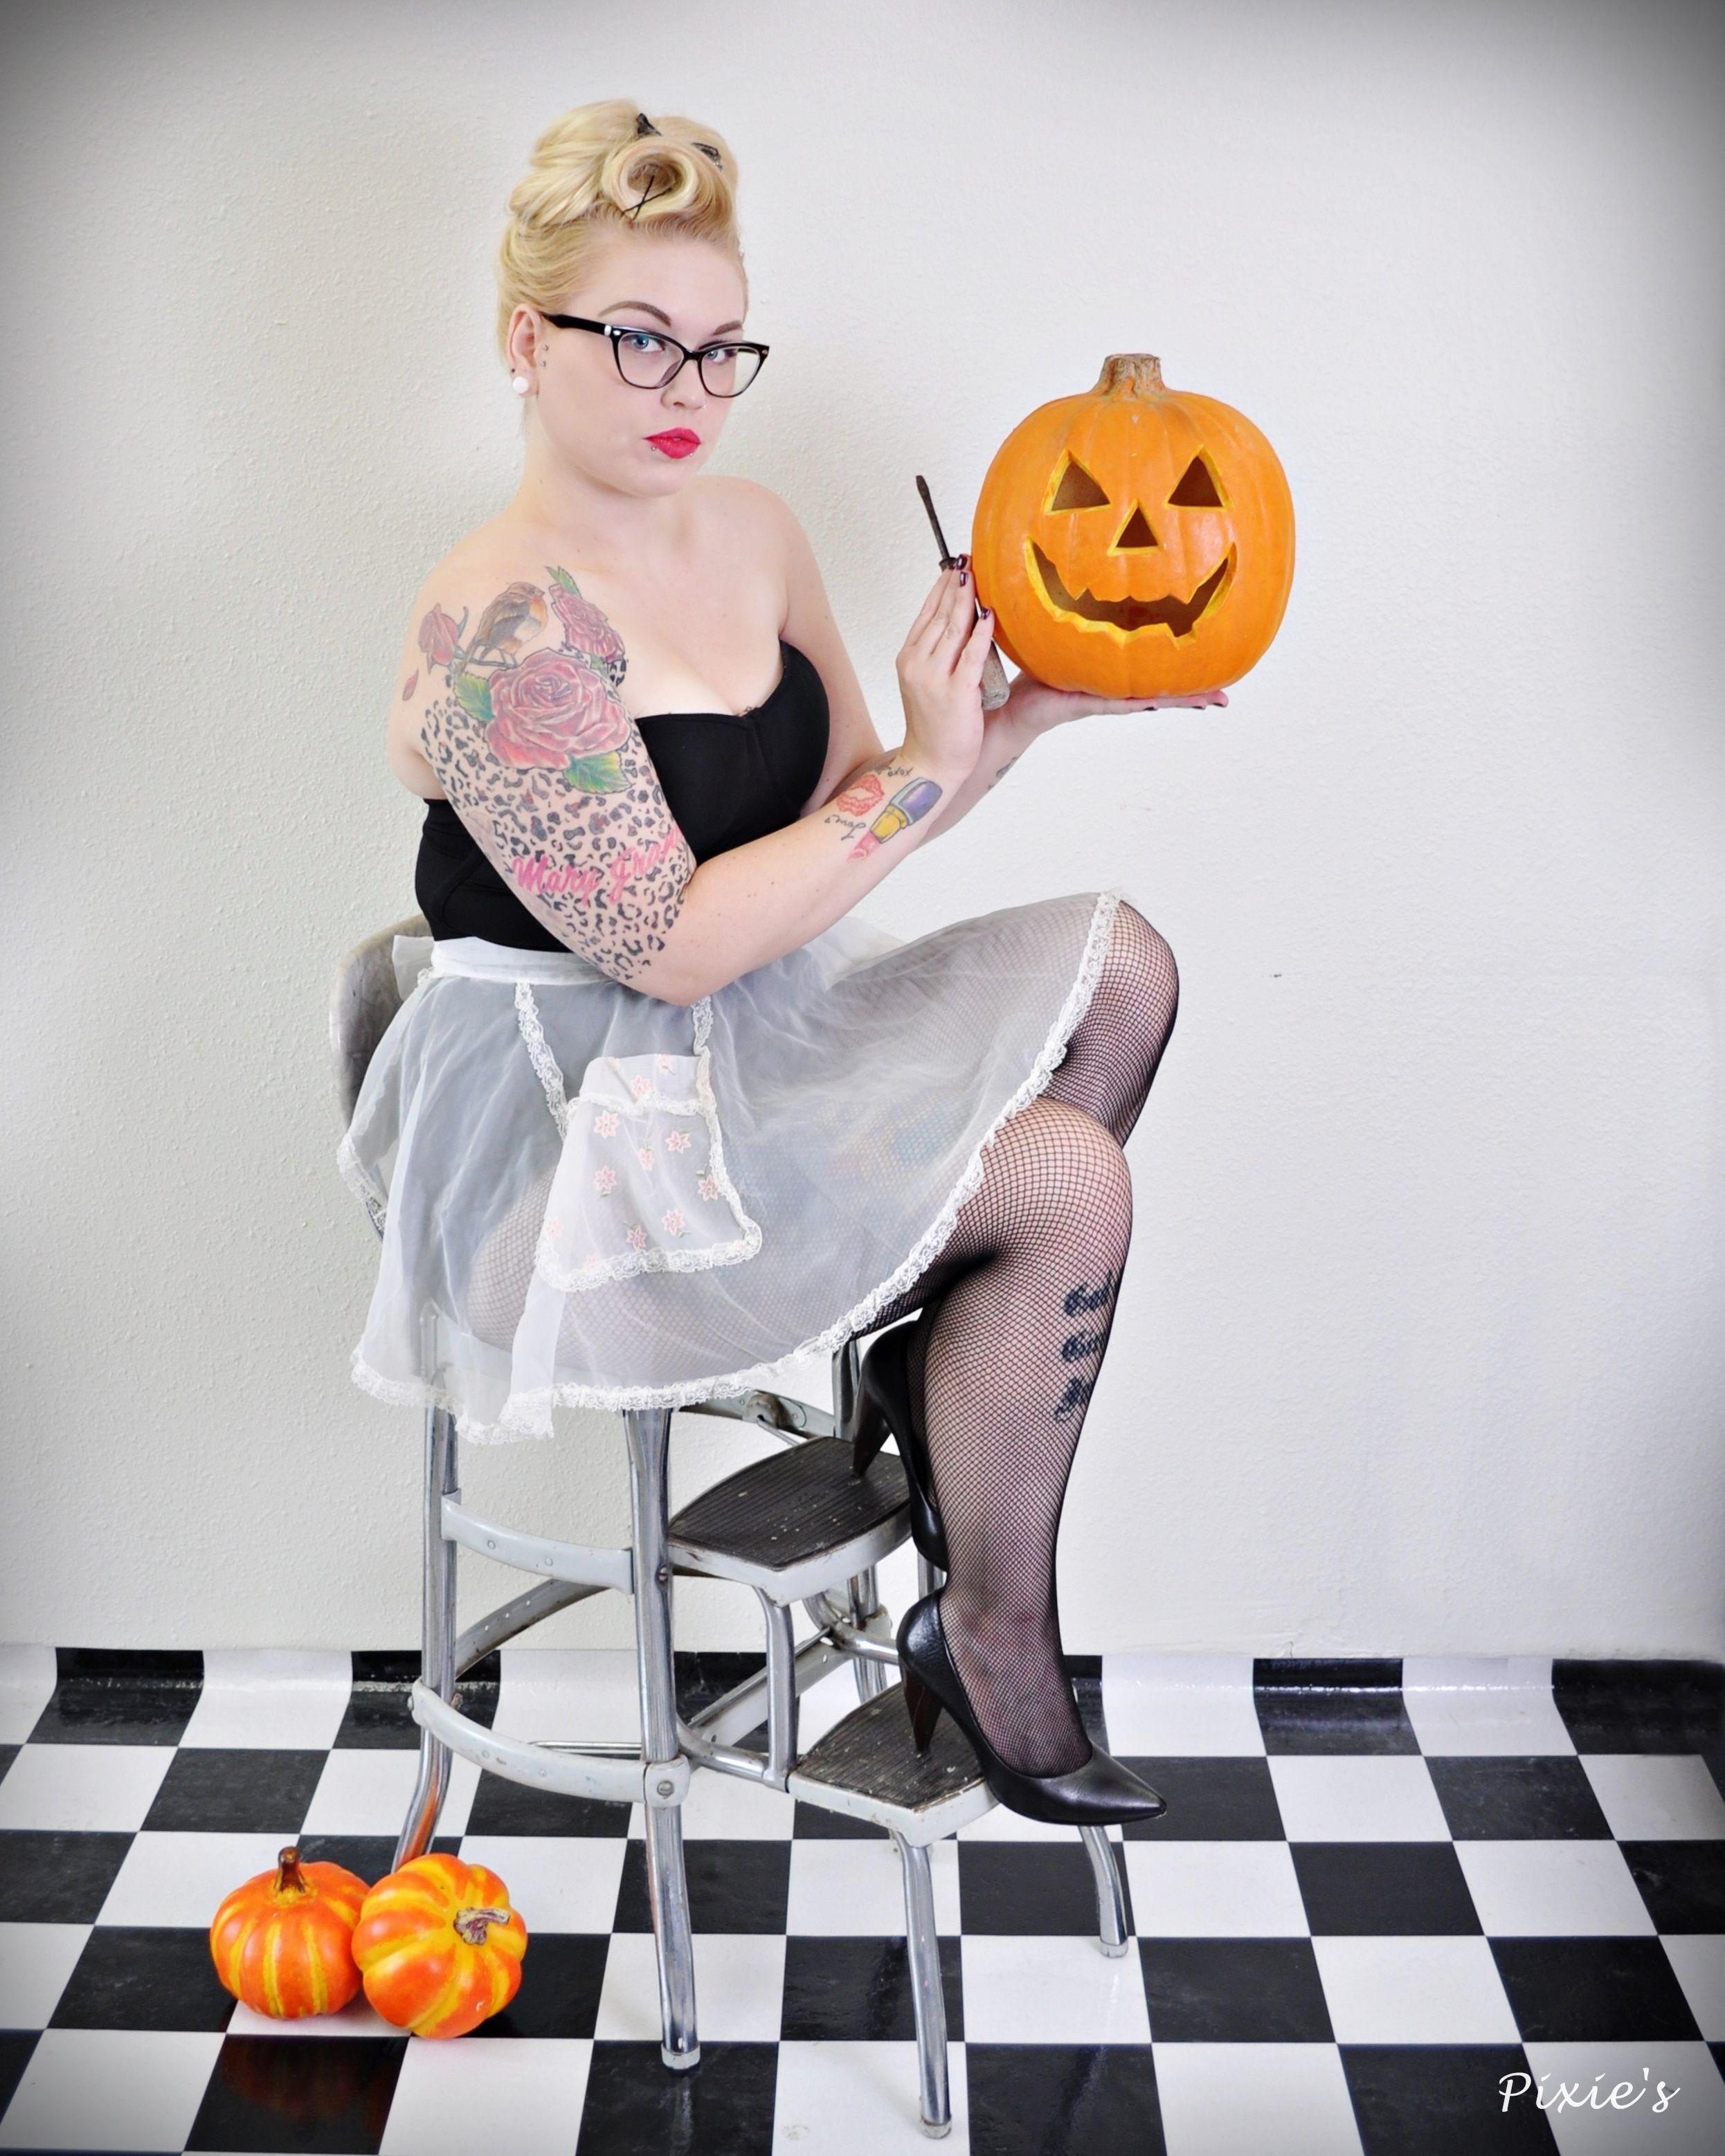 Halloween PinUp Photo: Pixie's PinUps Model: Lela Lightbulb